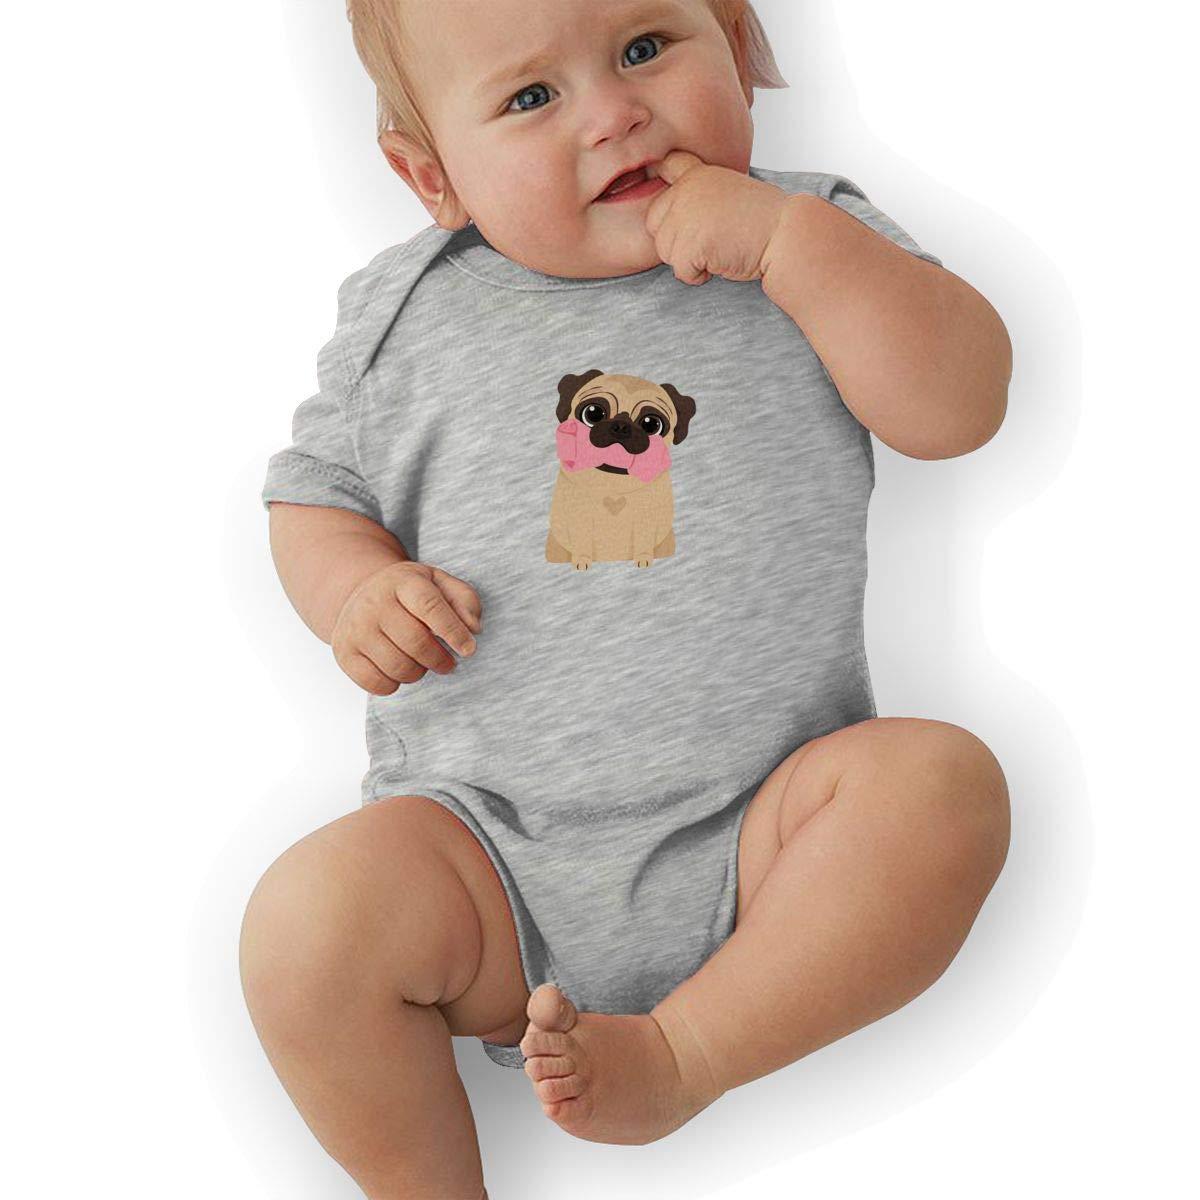 windekie Cute Bulldog Baby Onesies Toddler Baby Girl//Boy Unisex Clothes Romper Jumpsuit Bodysuit One Piece